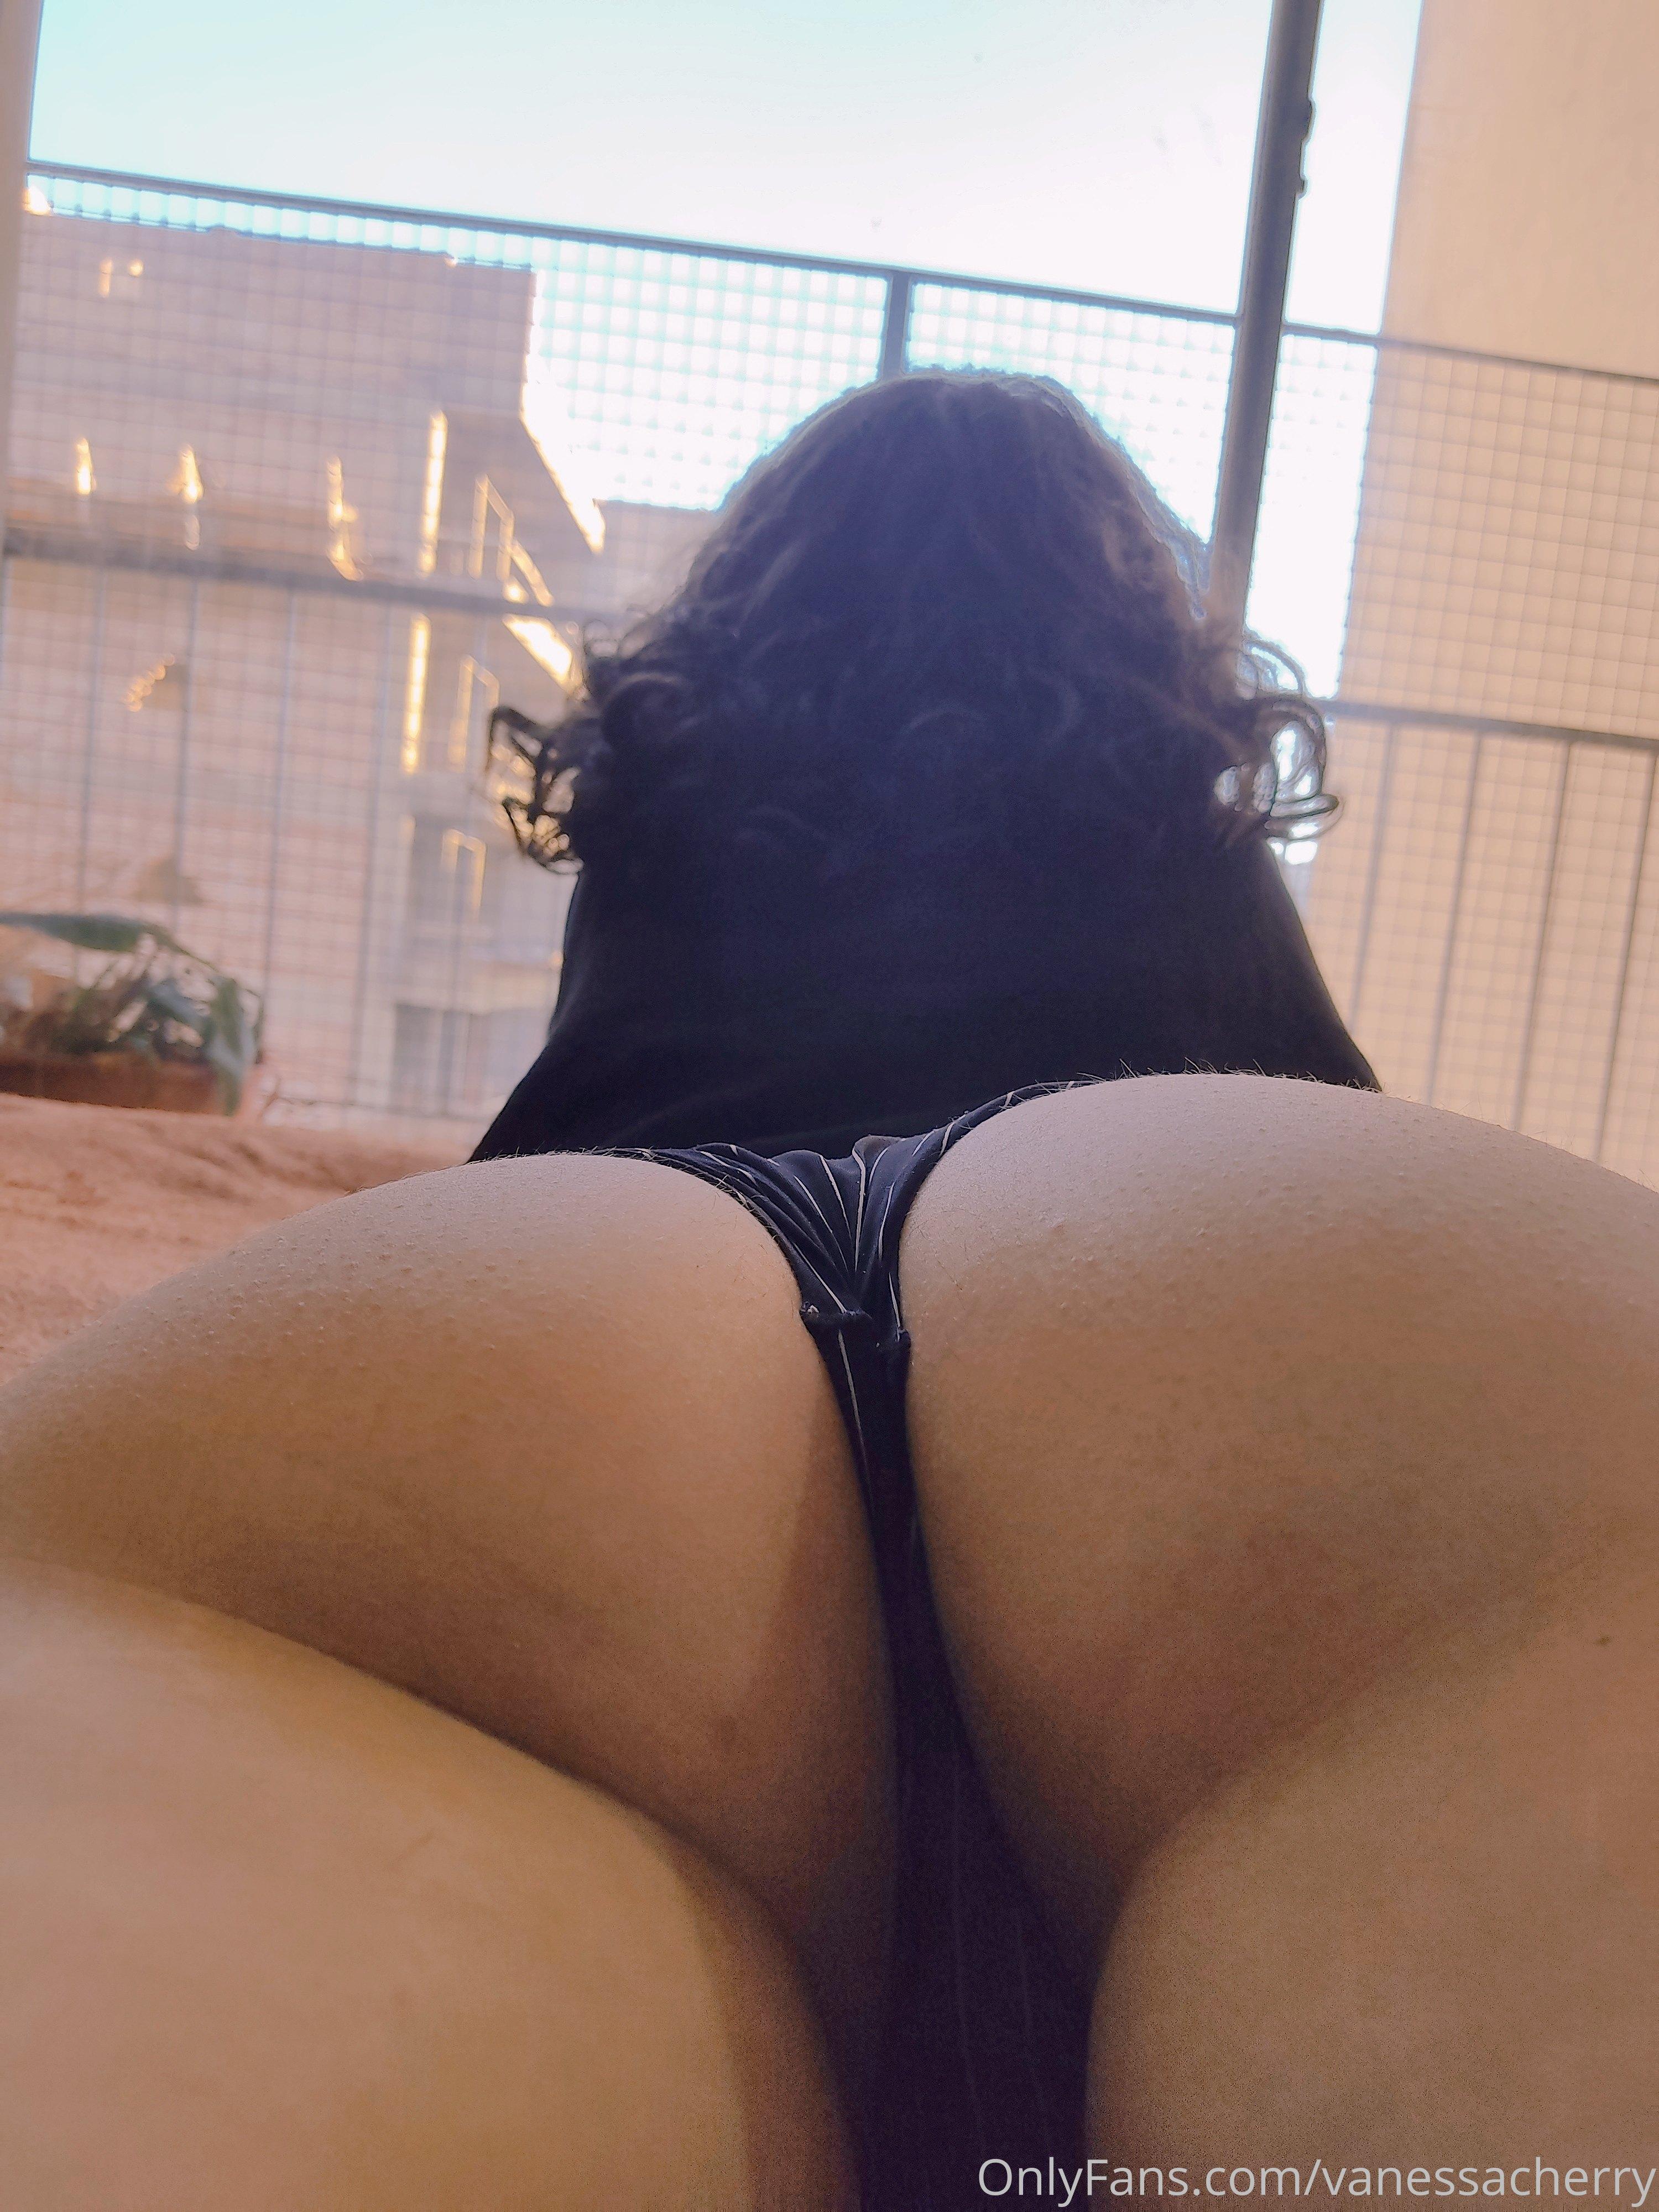 Vanessacherry 0292